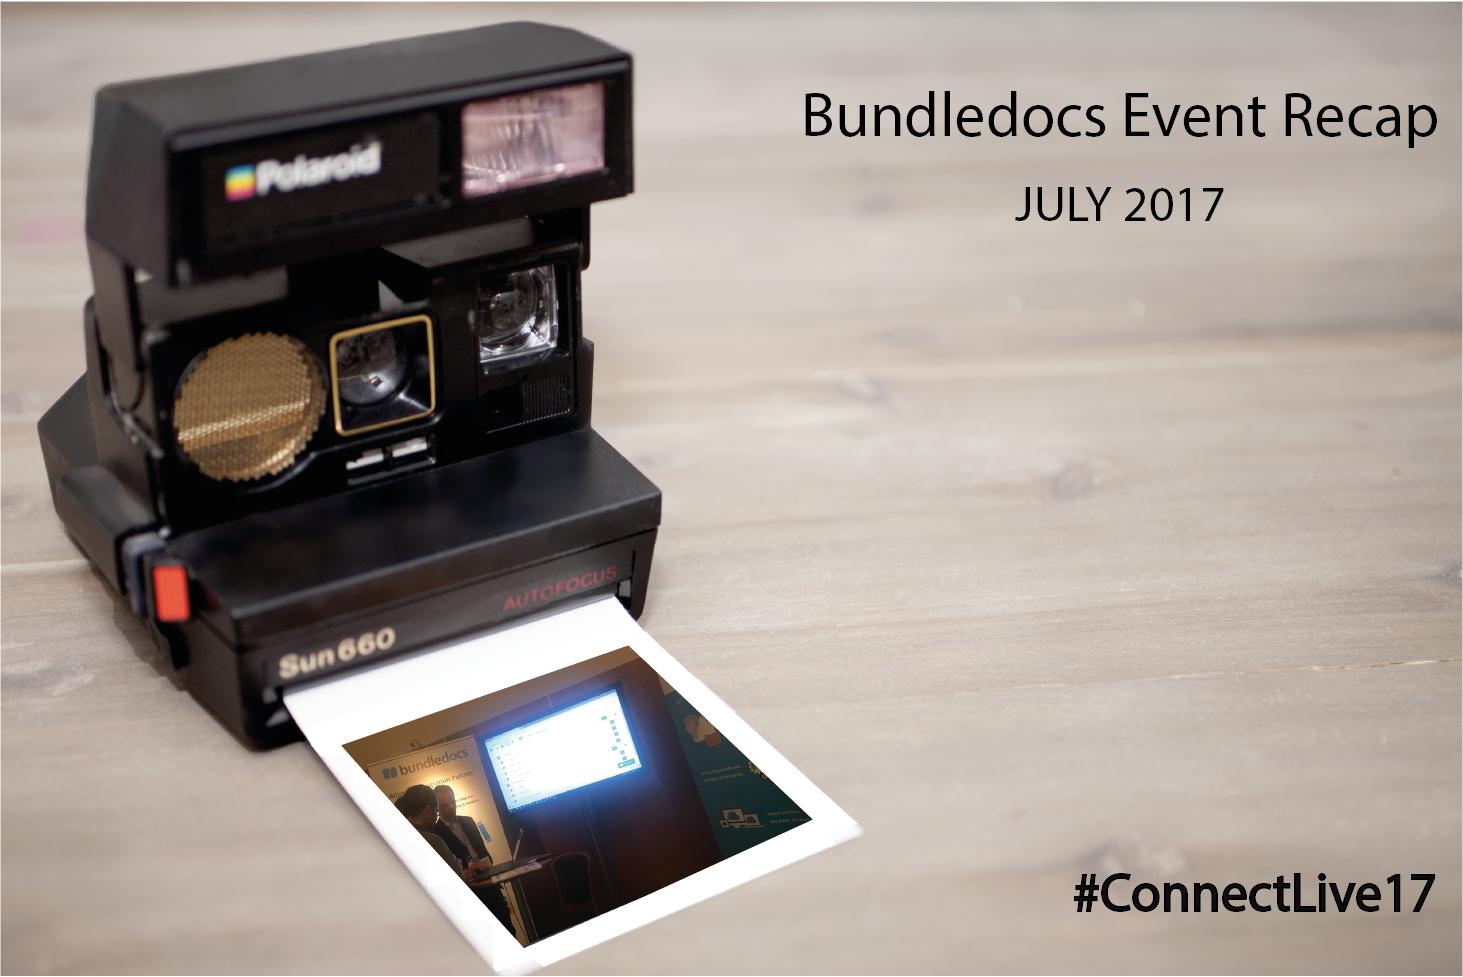 Bundledocs_Event_Recap_ConnectLive17.png